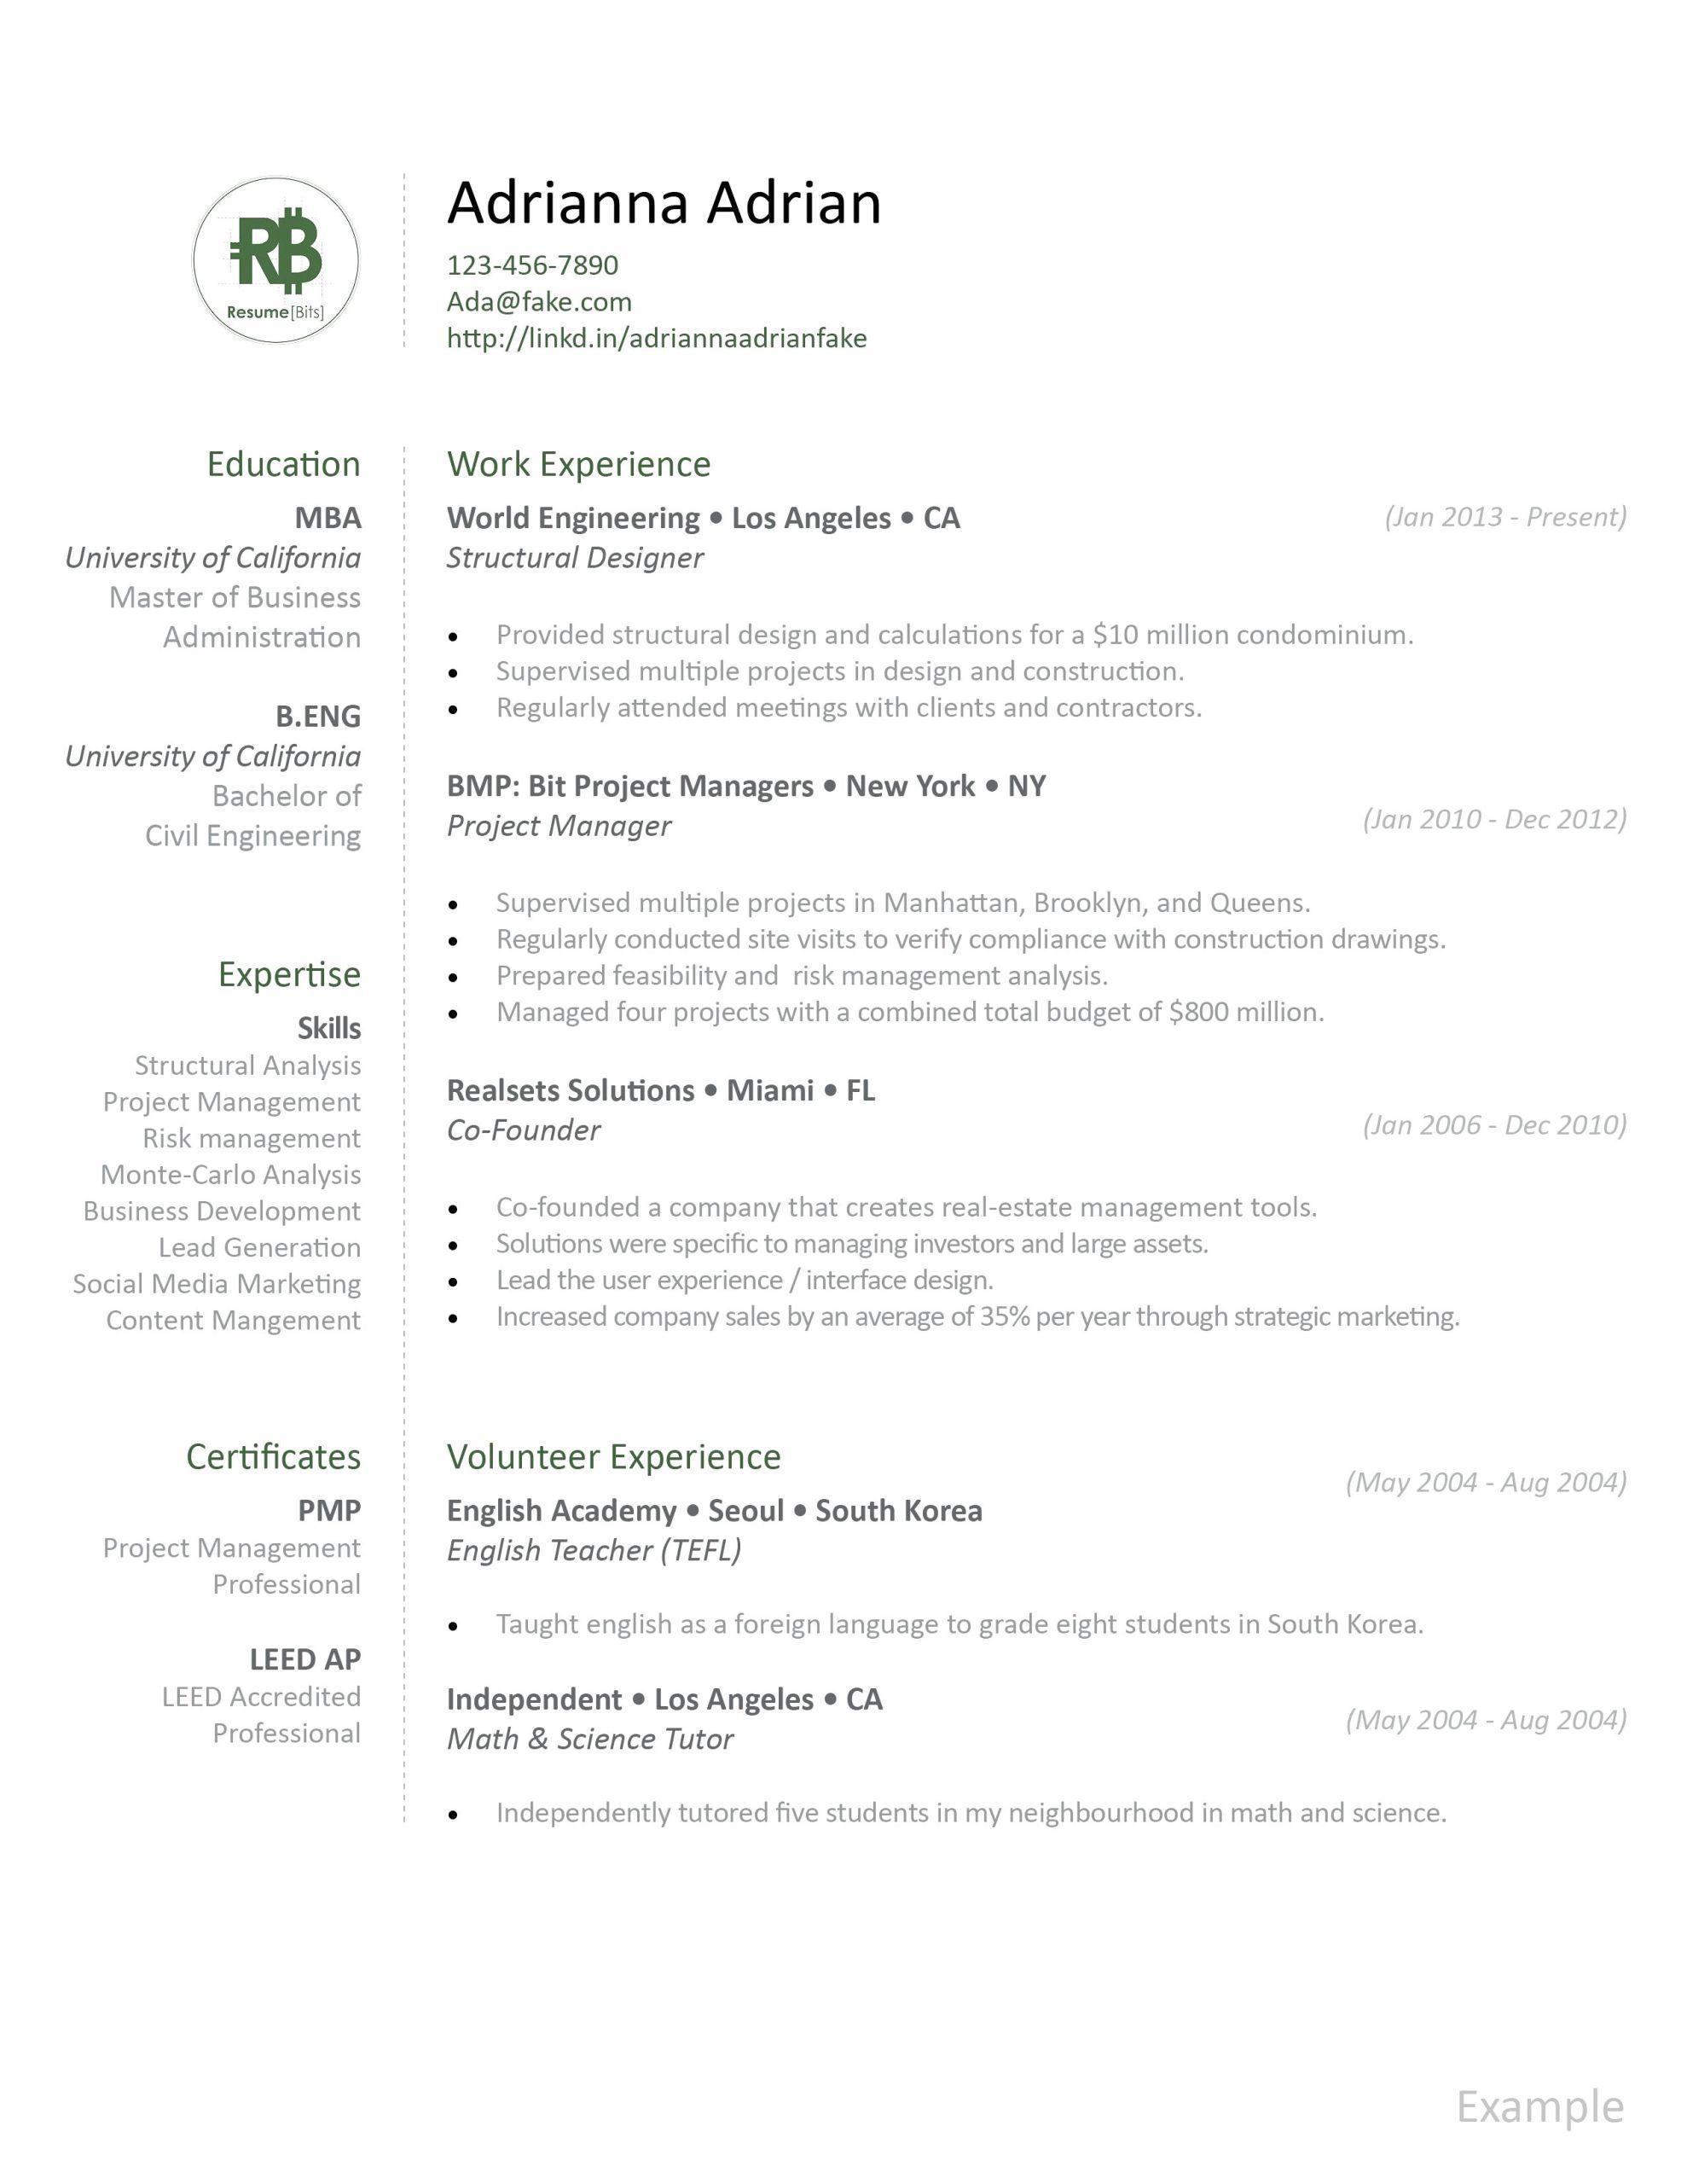 Reddit Computer Science Student Resume Resume format Reddit Resume format